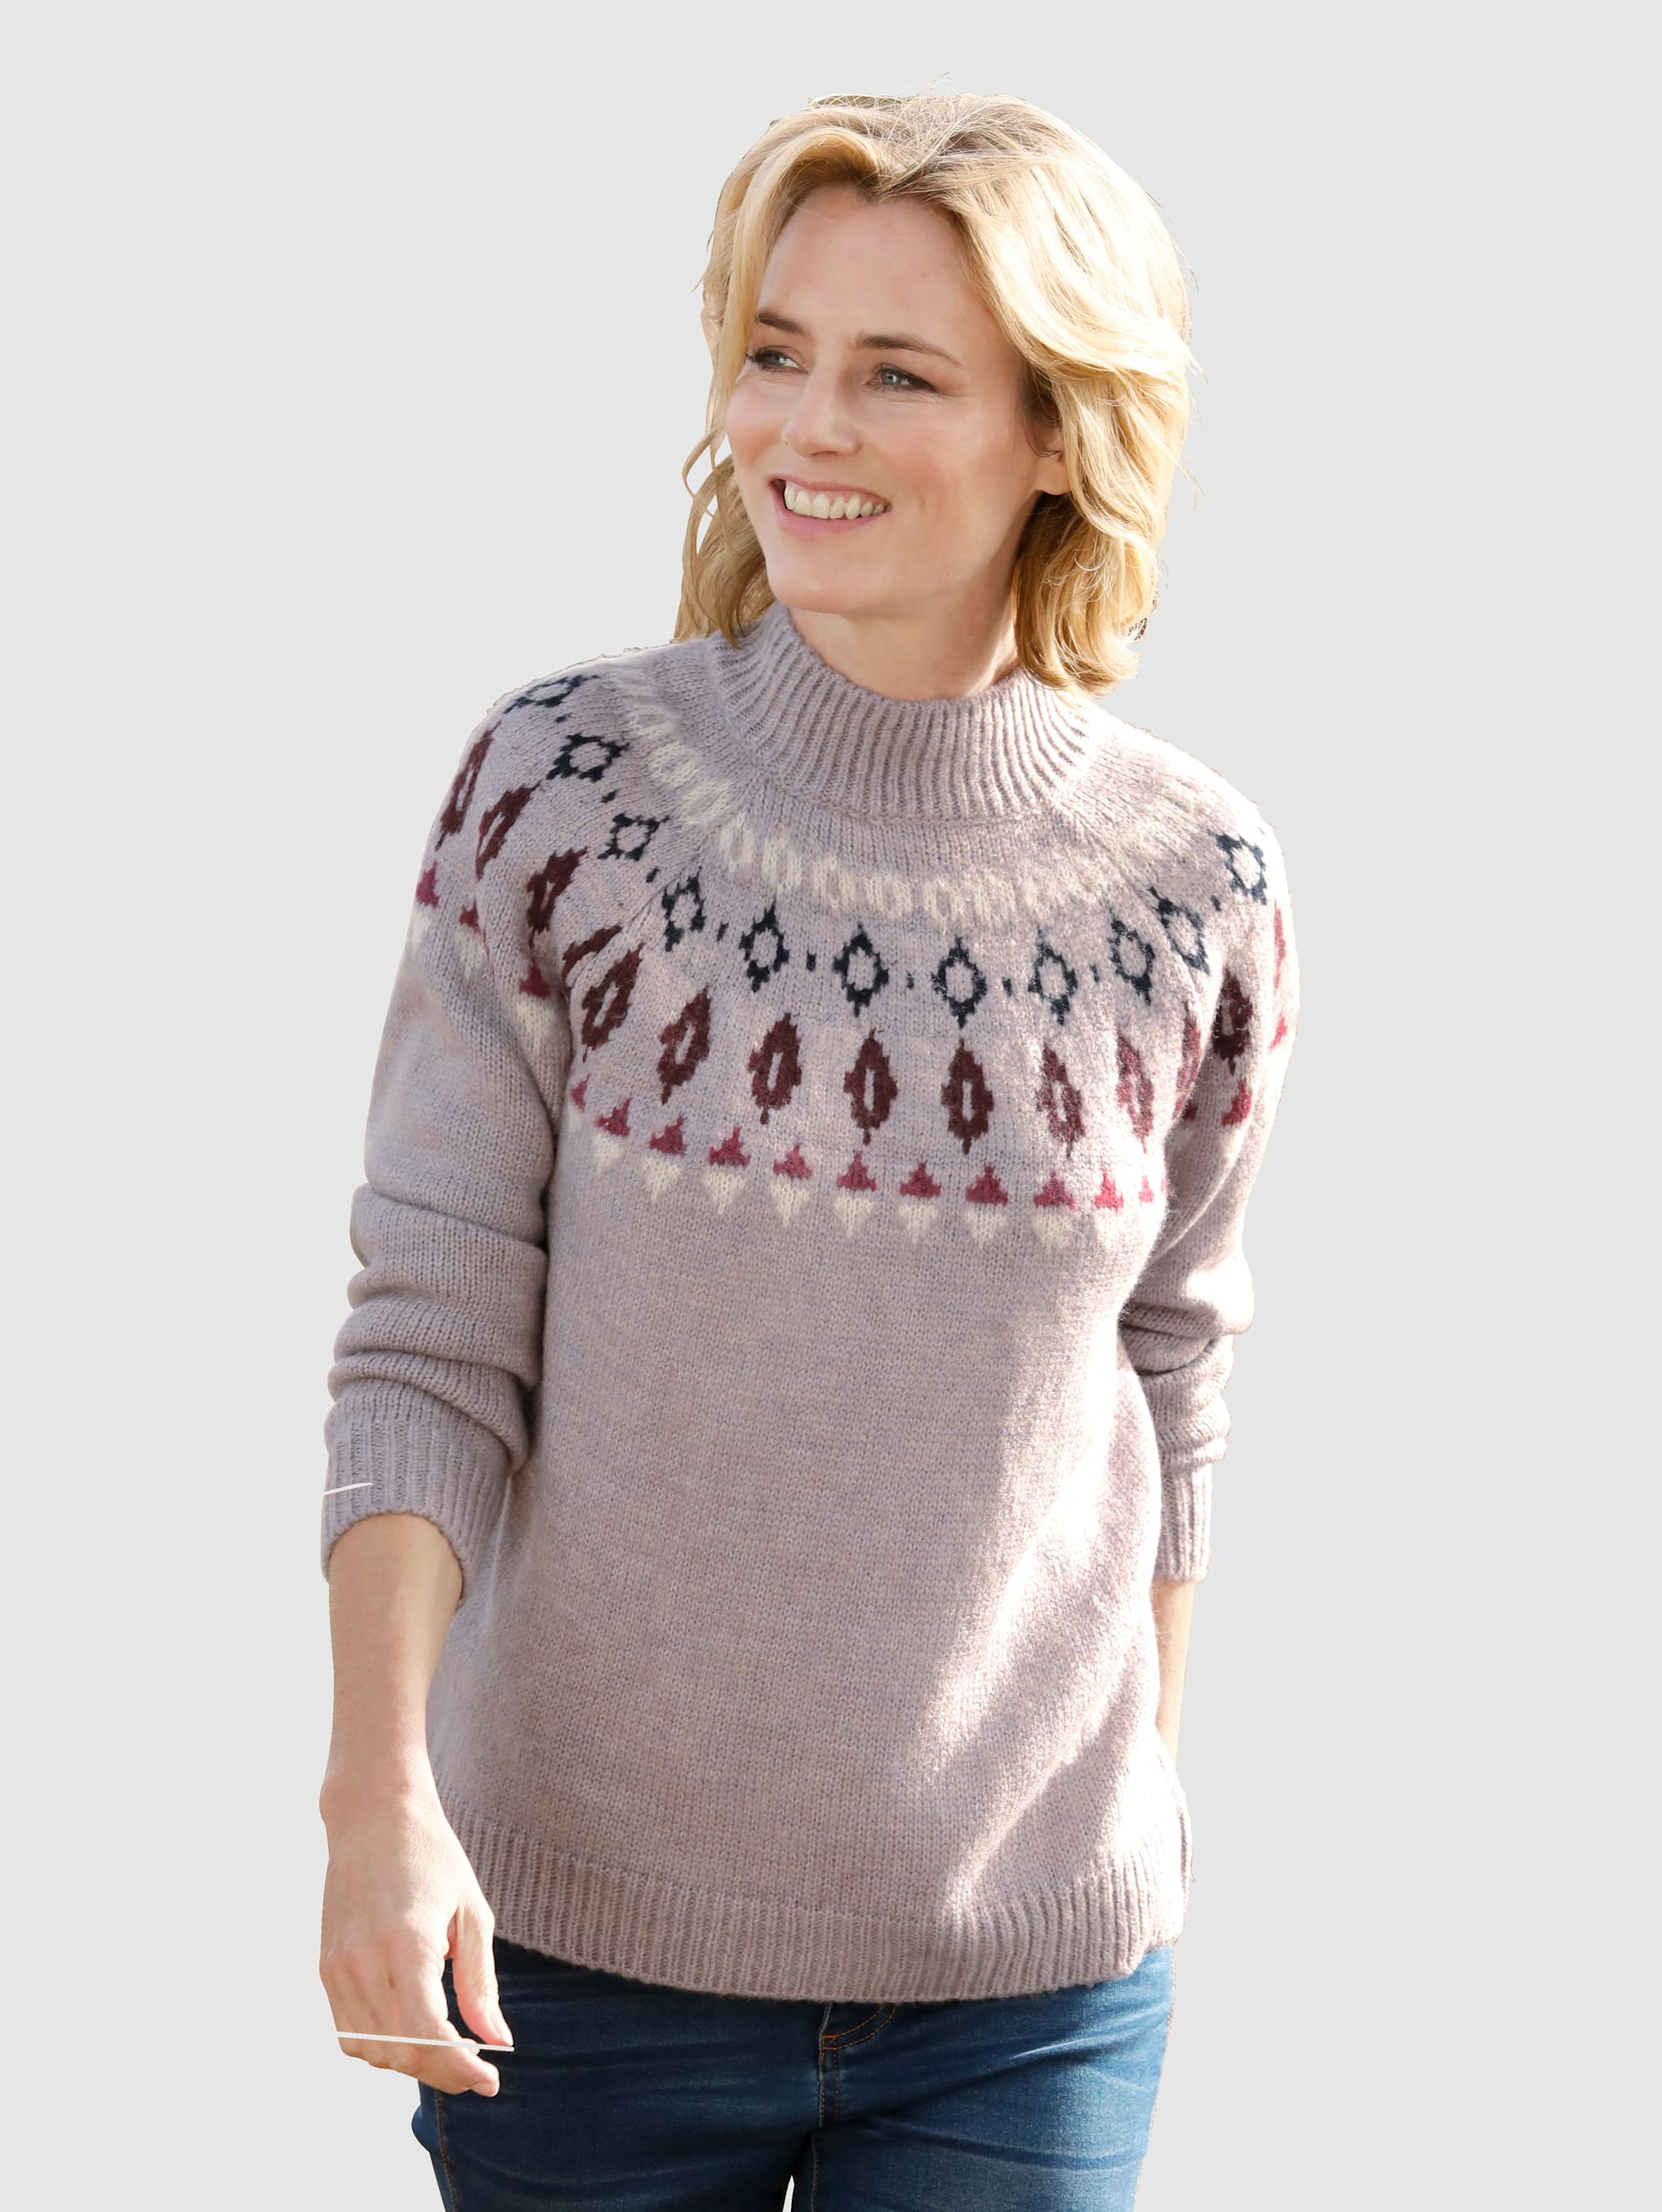 Dress In Norwegerpullover | Bekleidung > Pullover > Norwegerpullover | Dress In